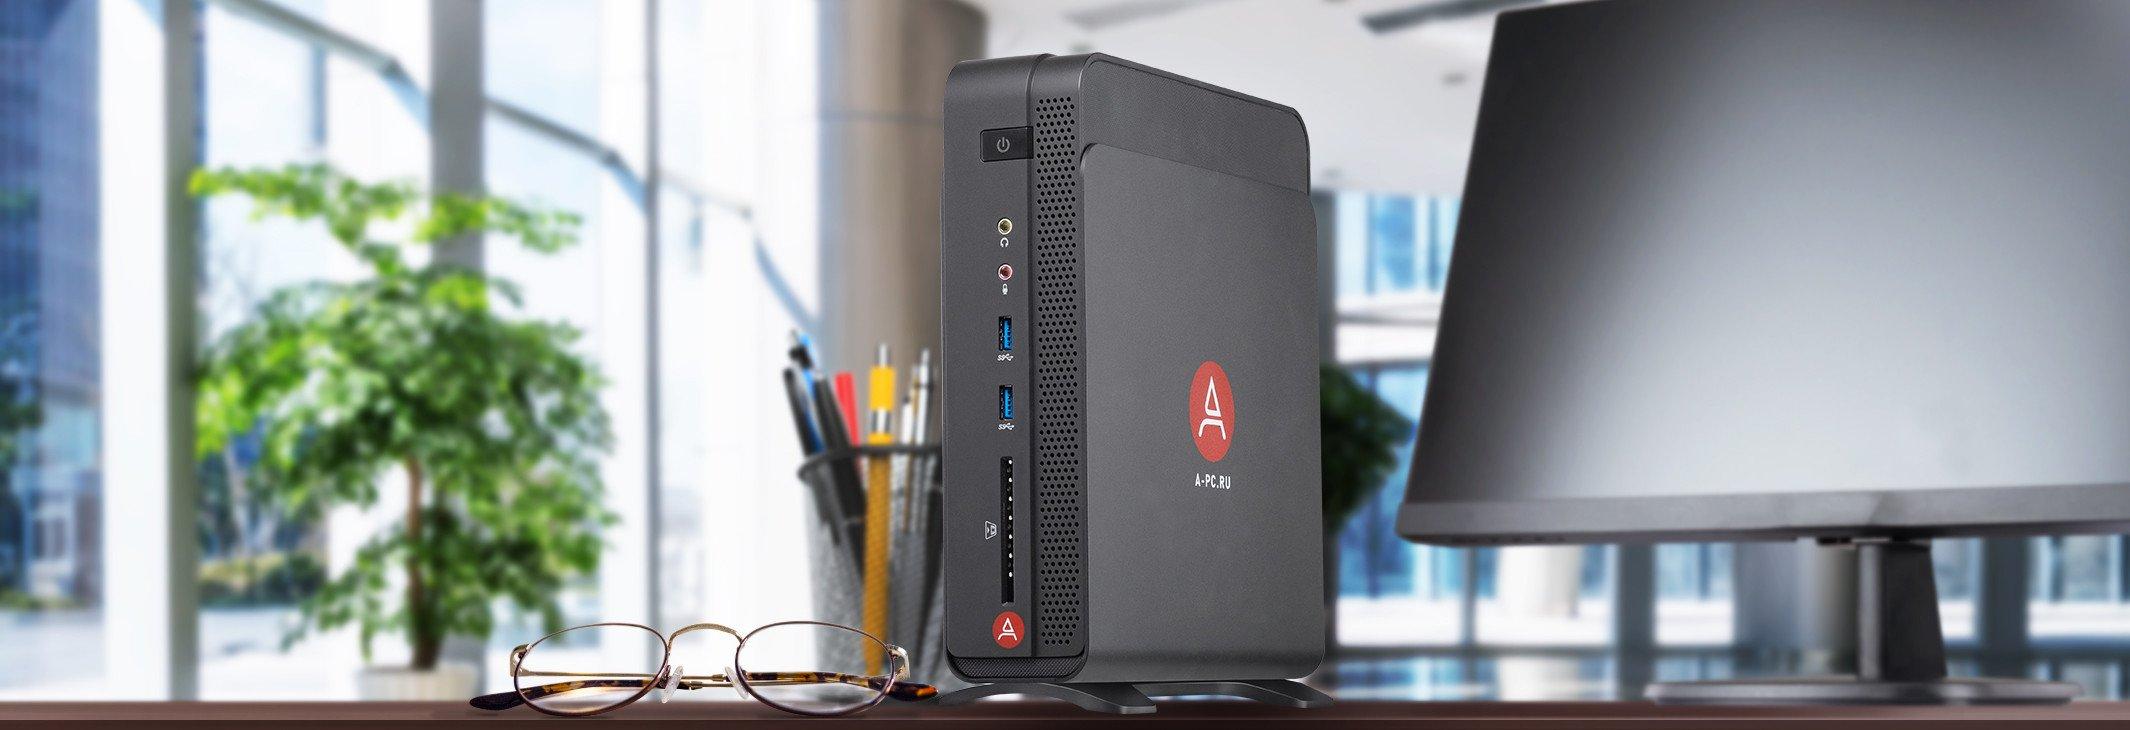 Компьютер-А